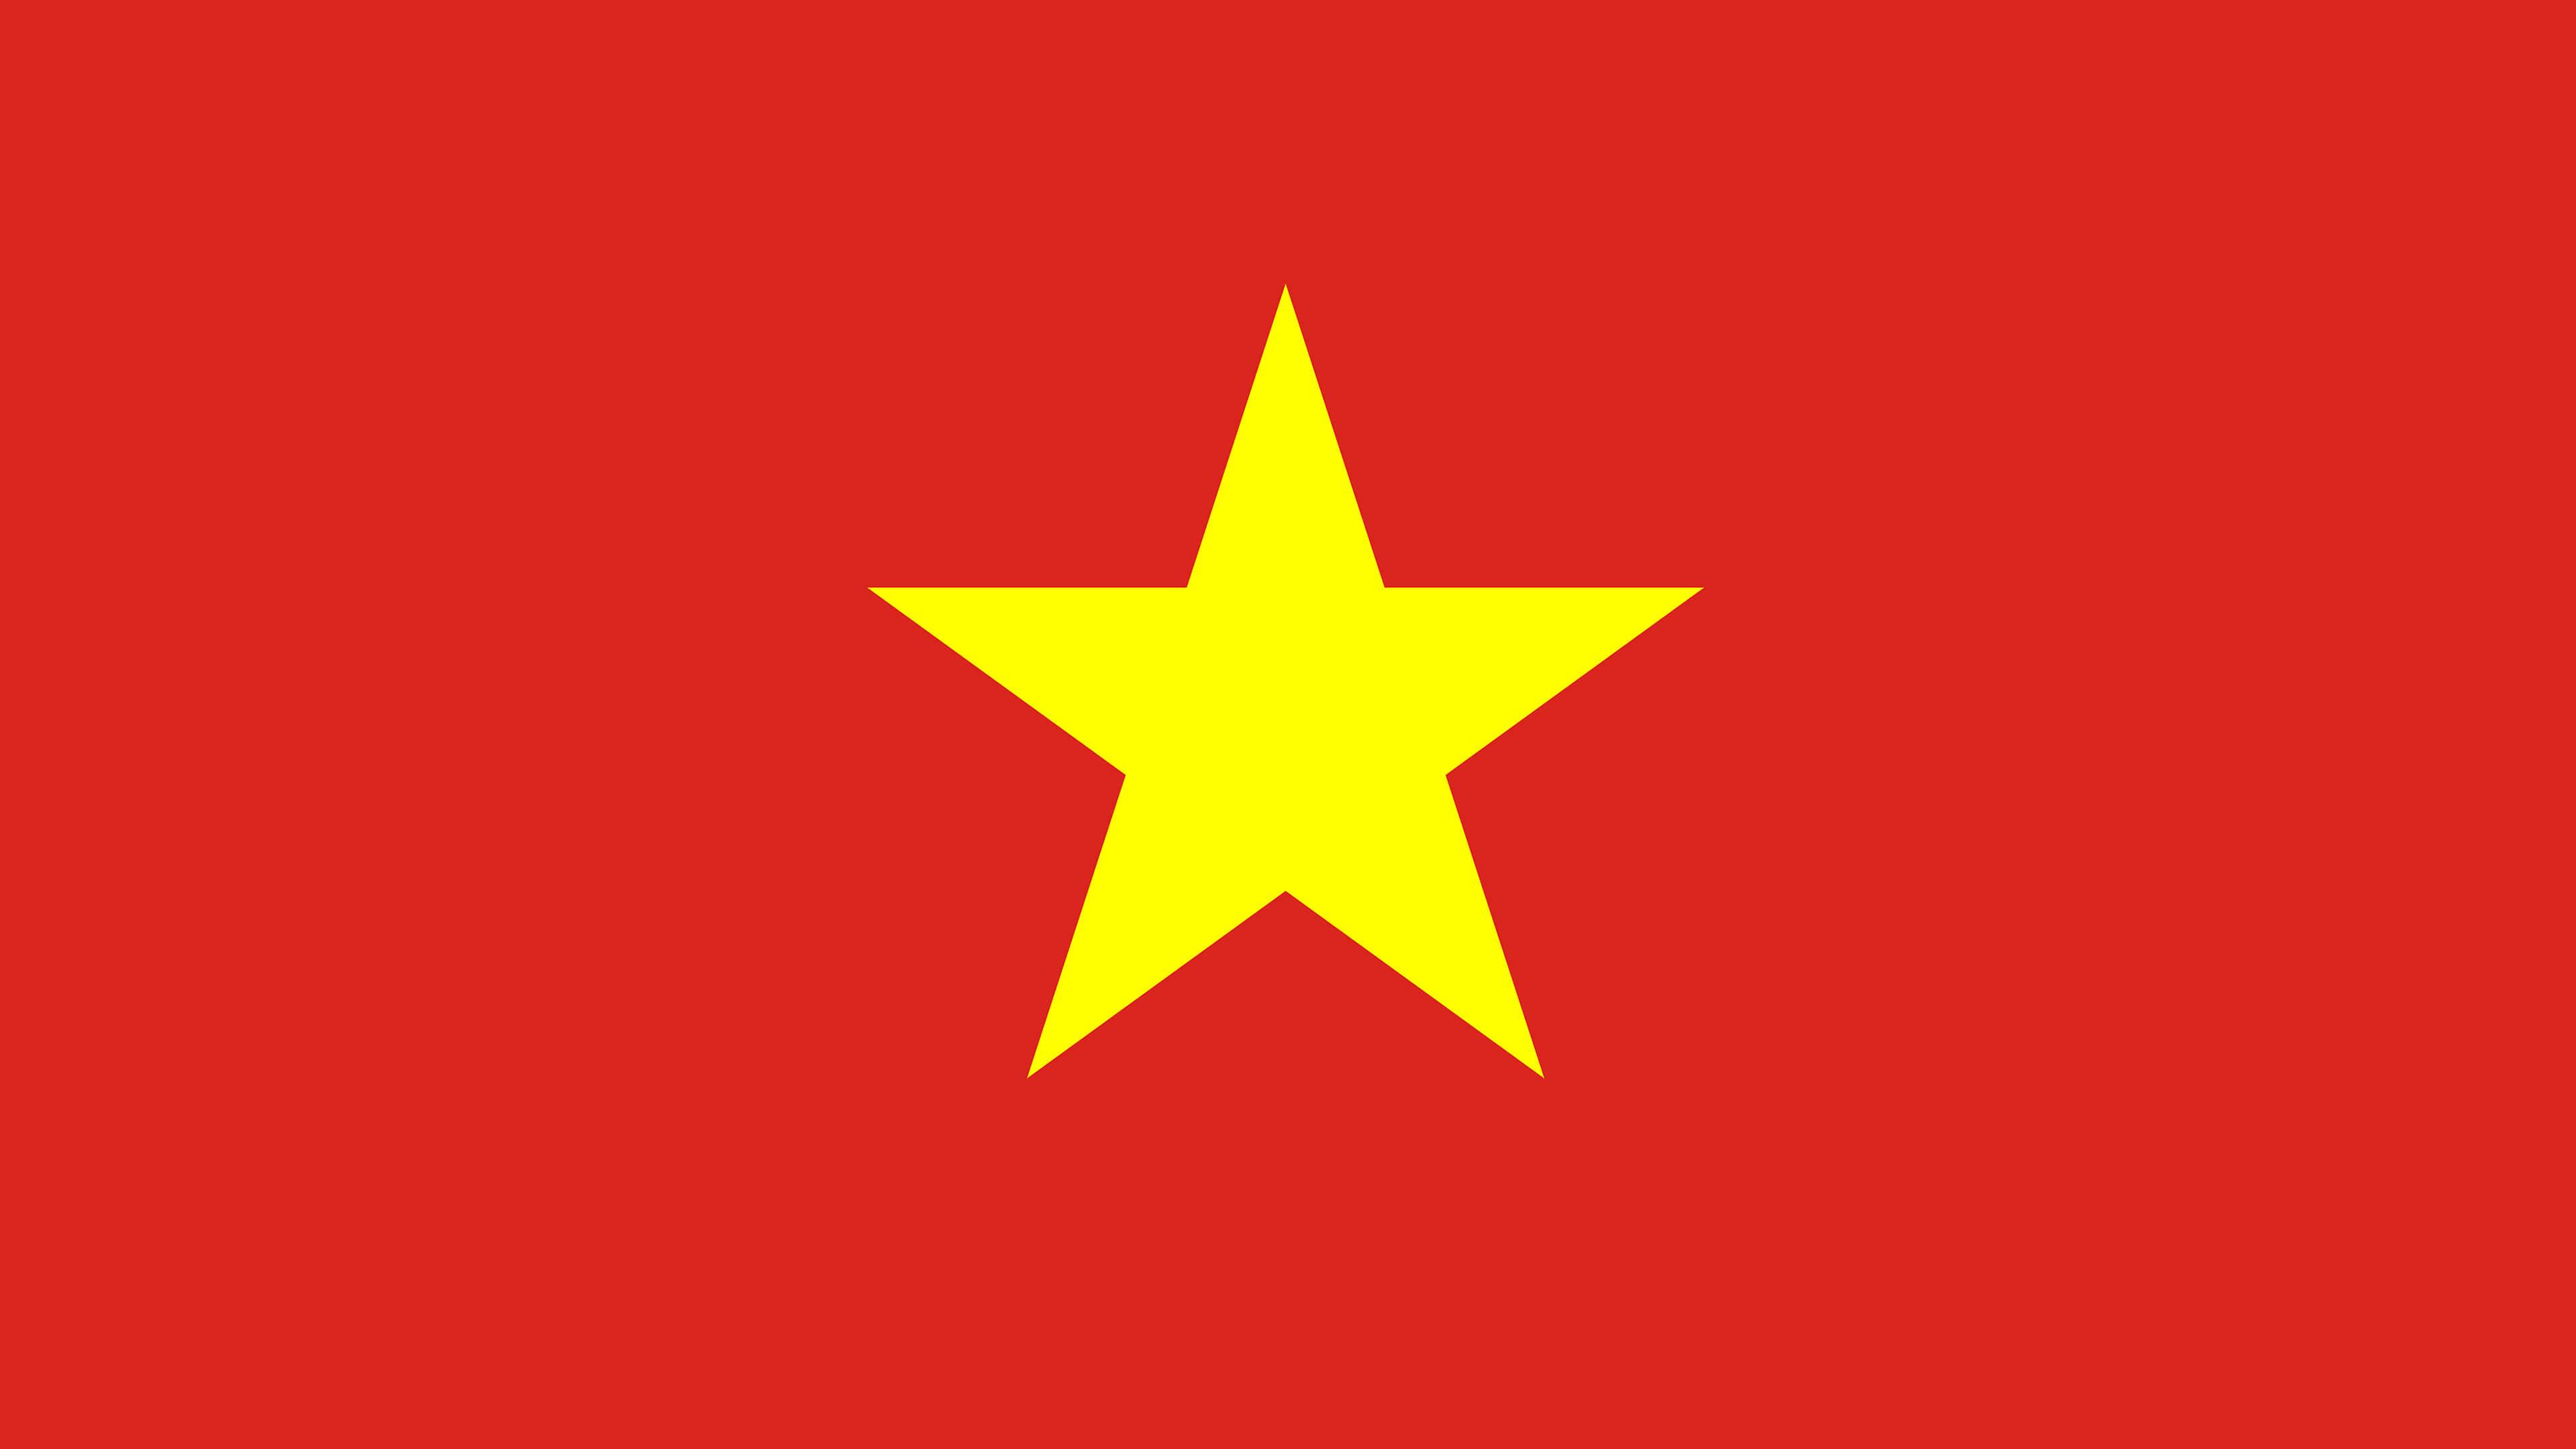 Vietnam Flag UHD 4K Wallpaper Pixelz 3840x2160